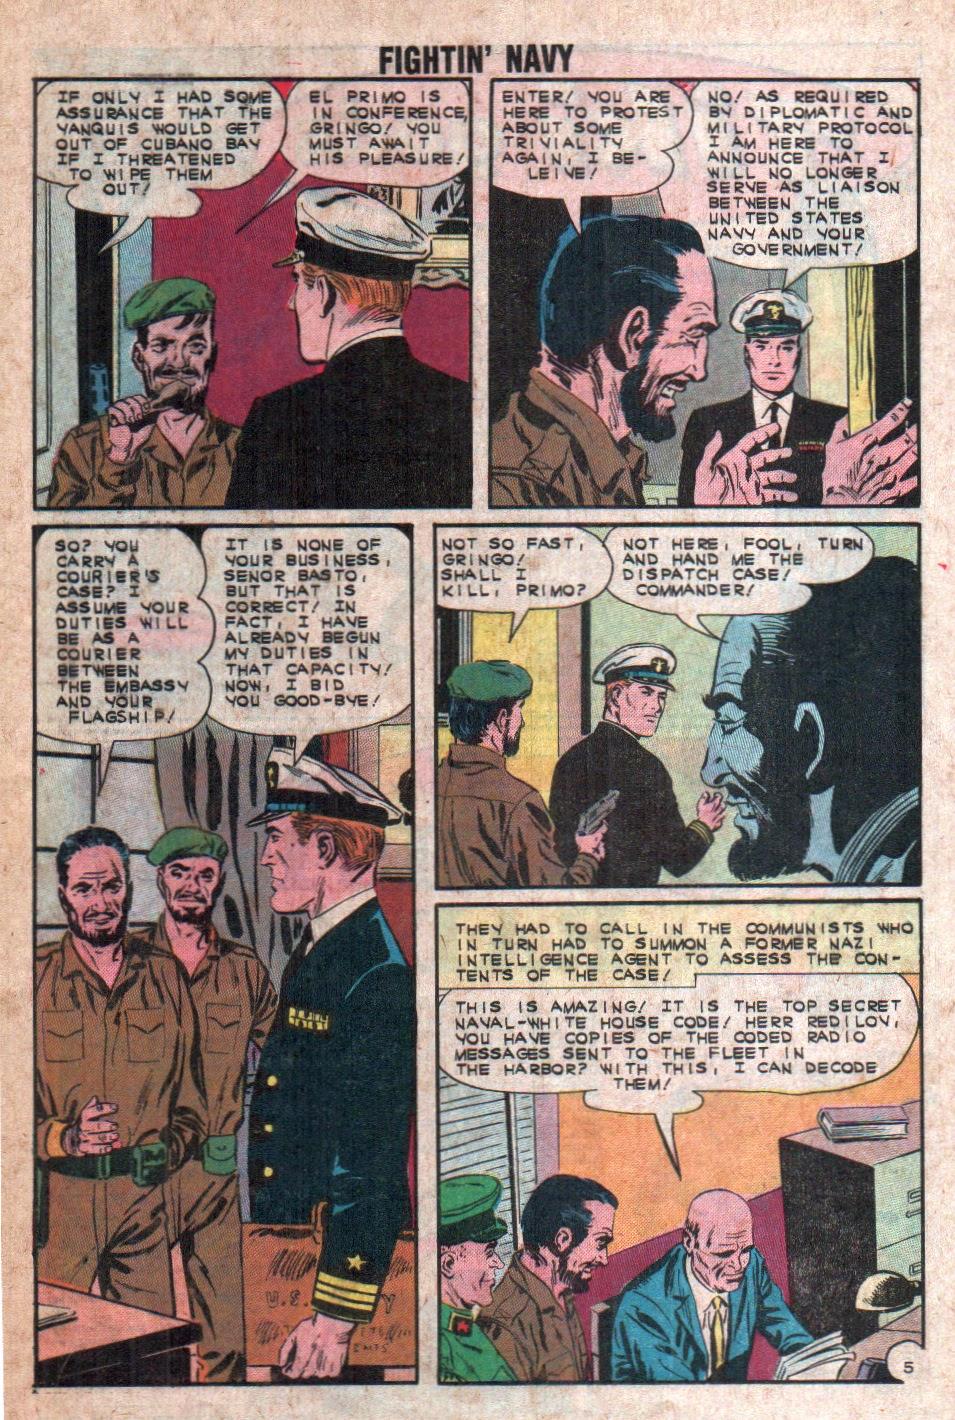 Read online Fightin' Navy comic -  Issue #108 - 16